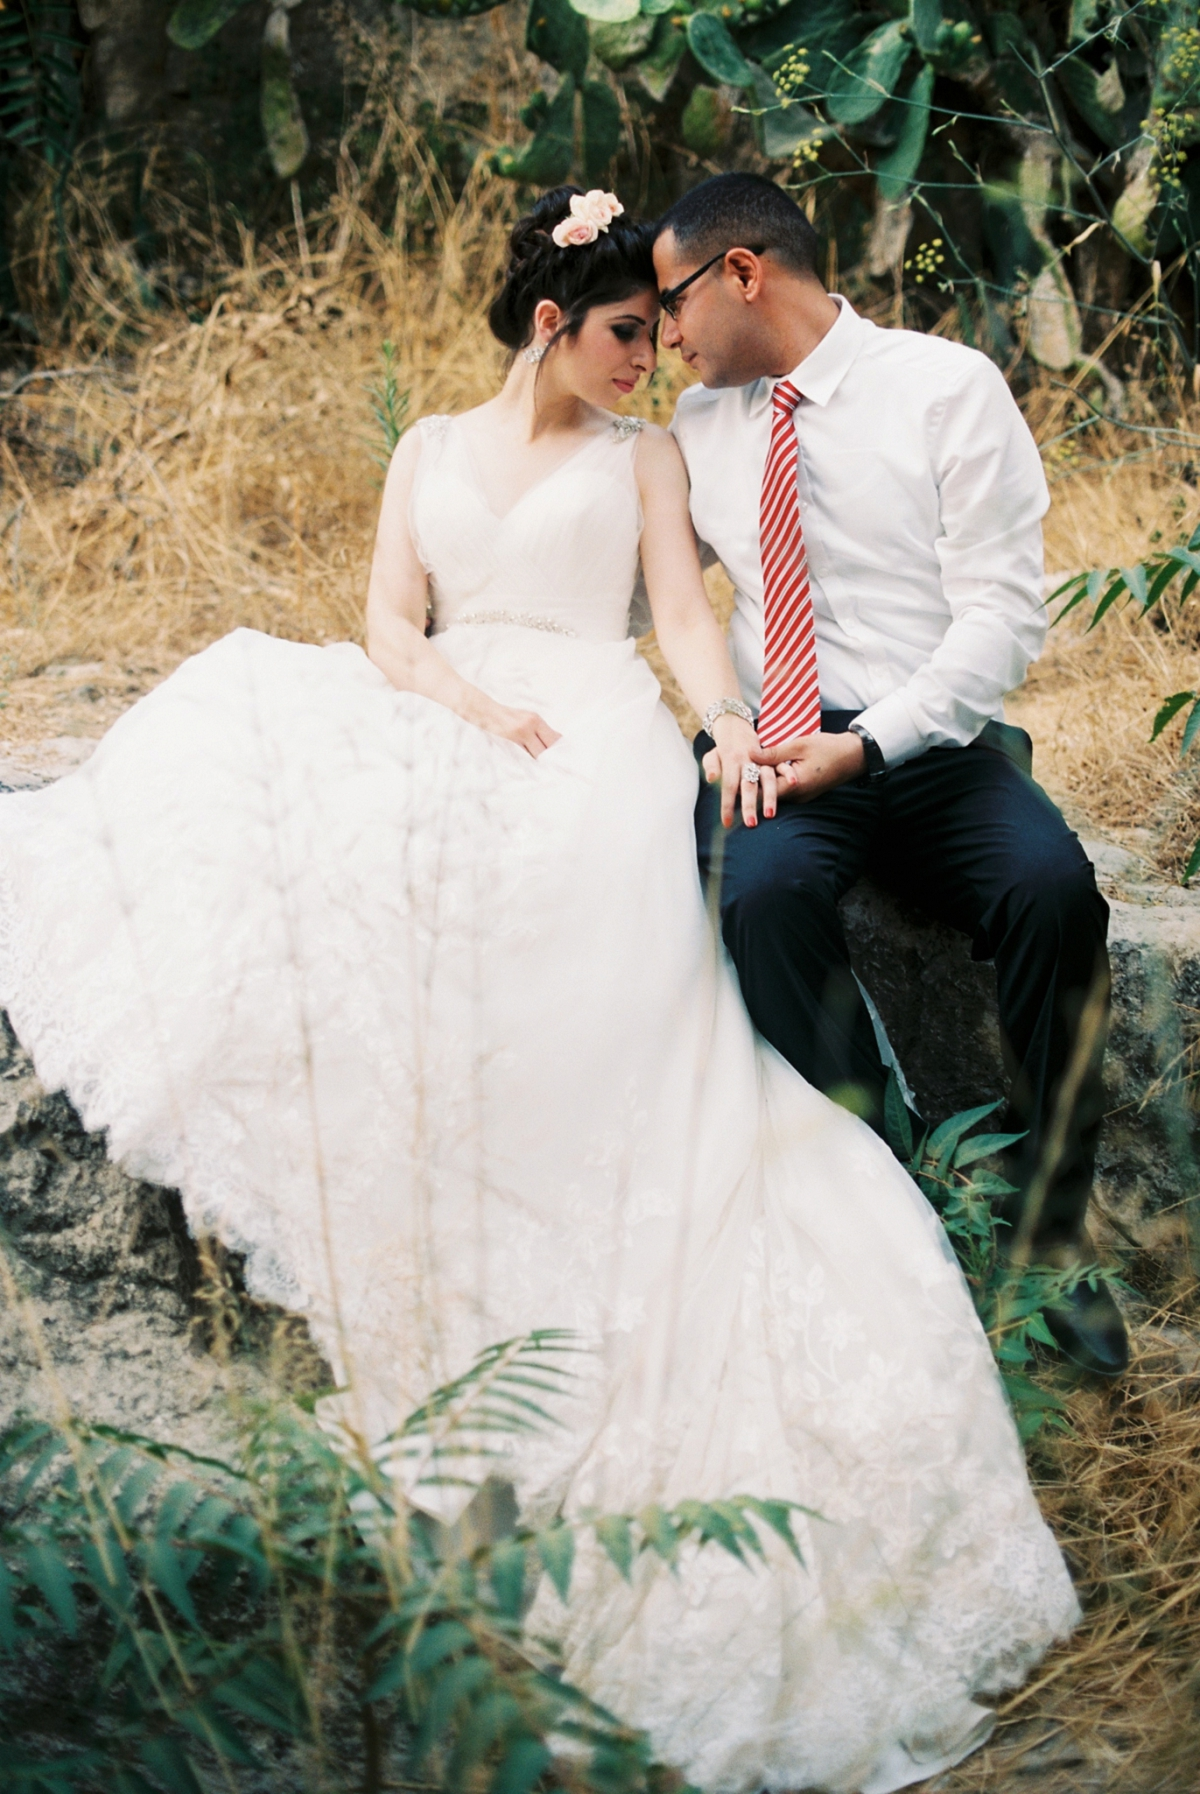 Lifta Bridal Portraits - Jerusalem Israel - Muna and Ali - Sigala Photography_0010